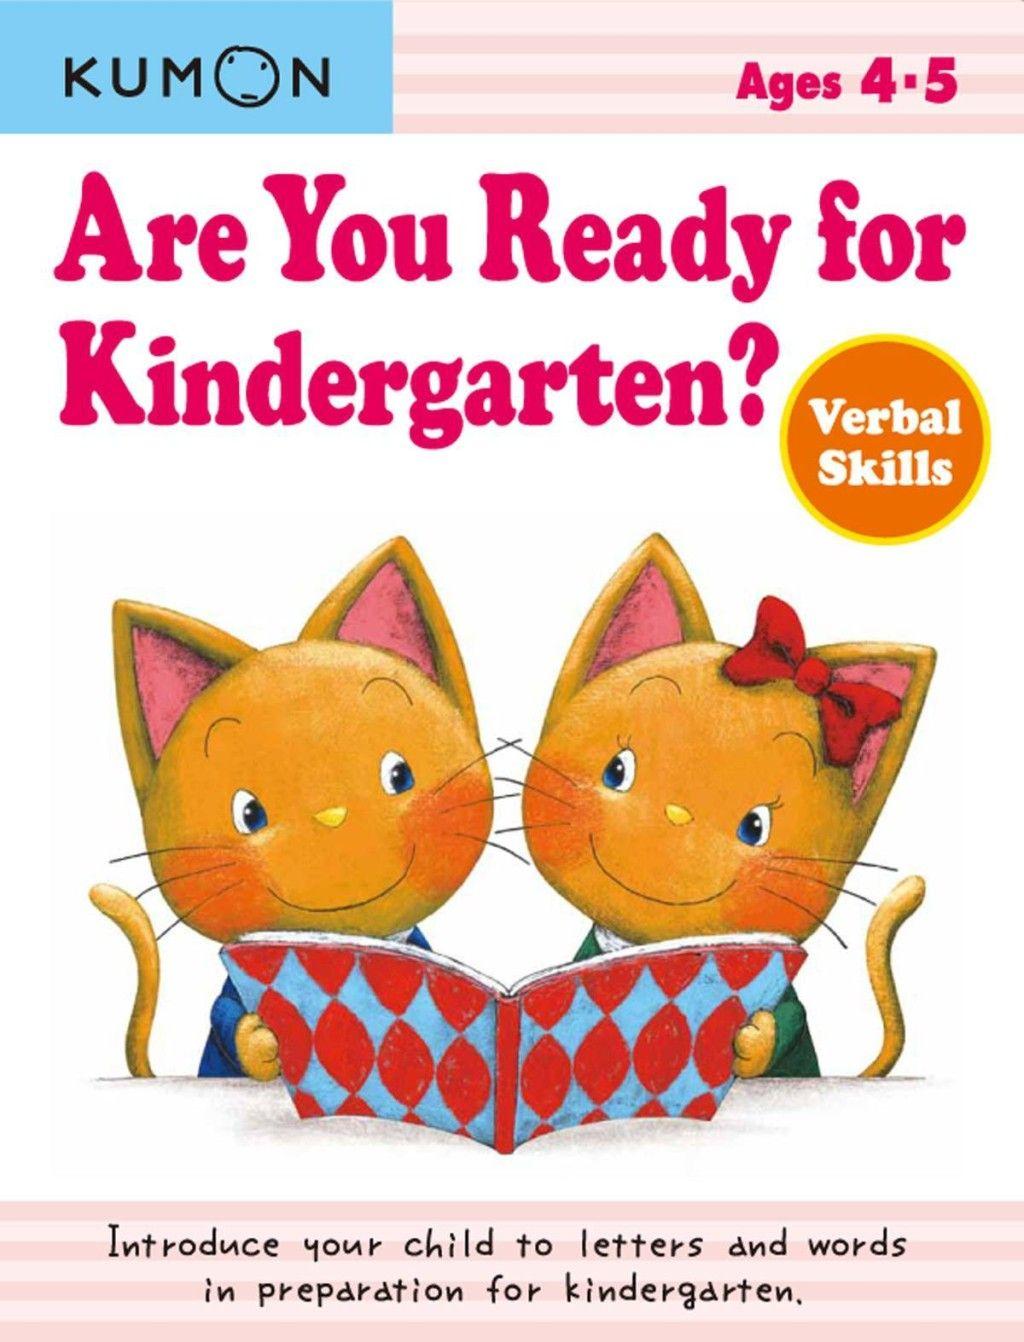 Pin By Nurul Nurul On Lka Preschool Education Kindergarten